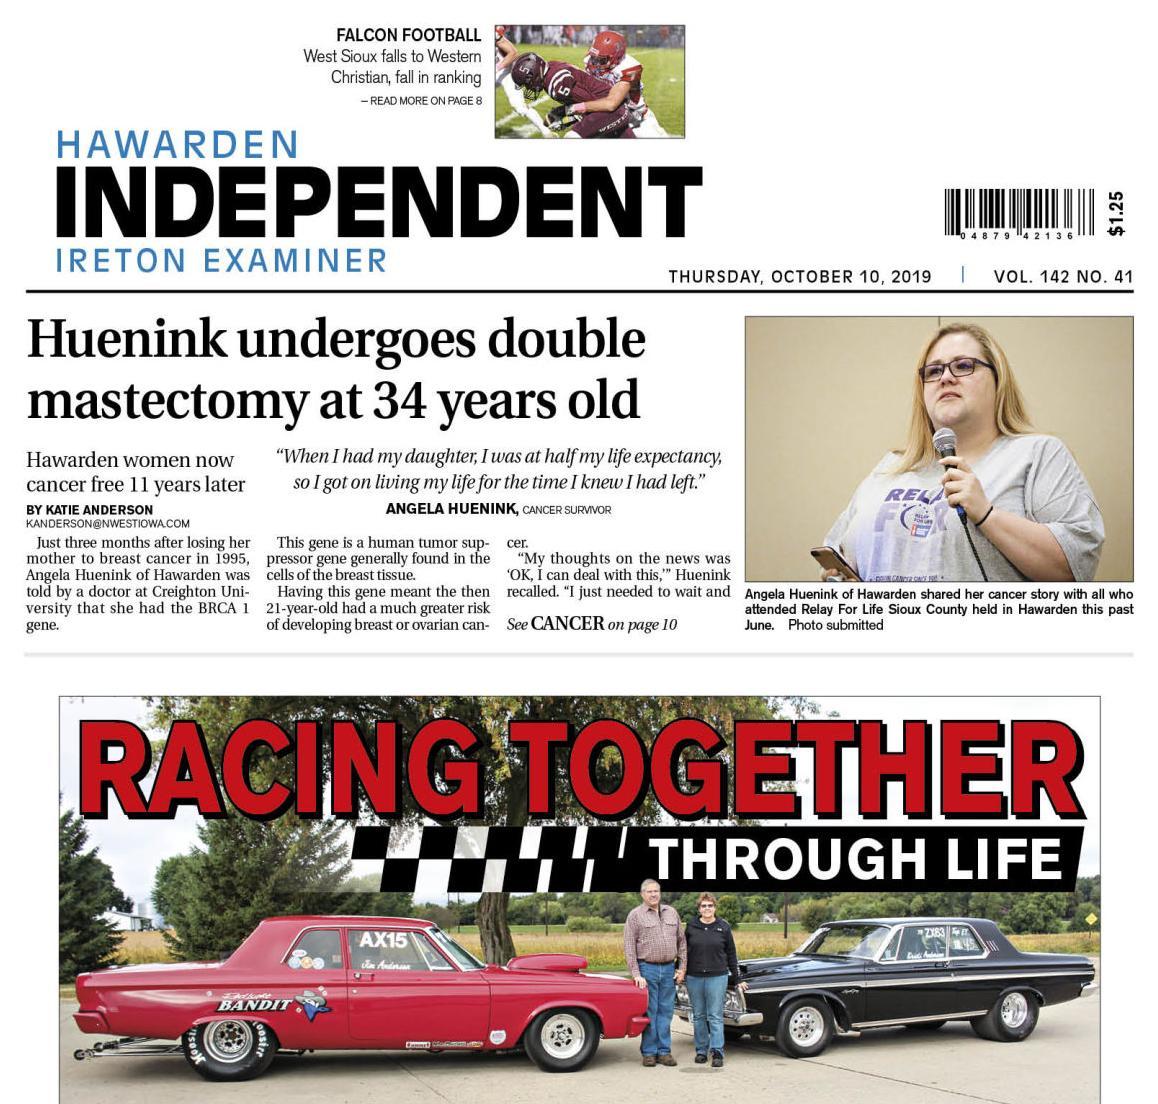 Hawarden Independent/Ireton Examiner Oct. 10, 2019